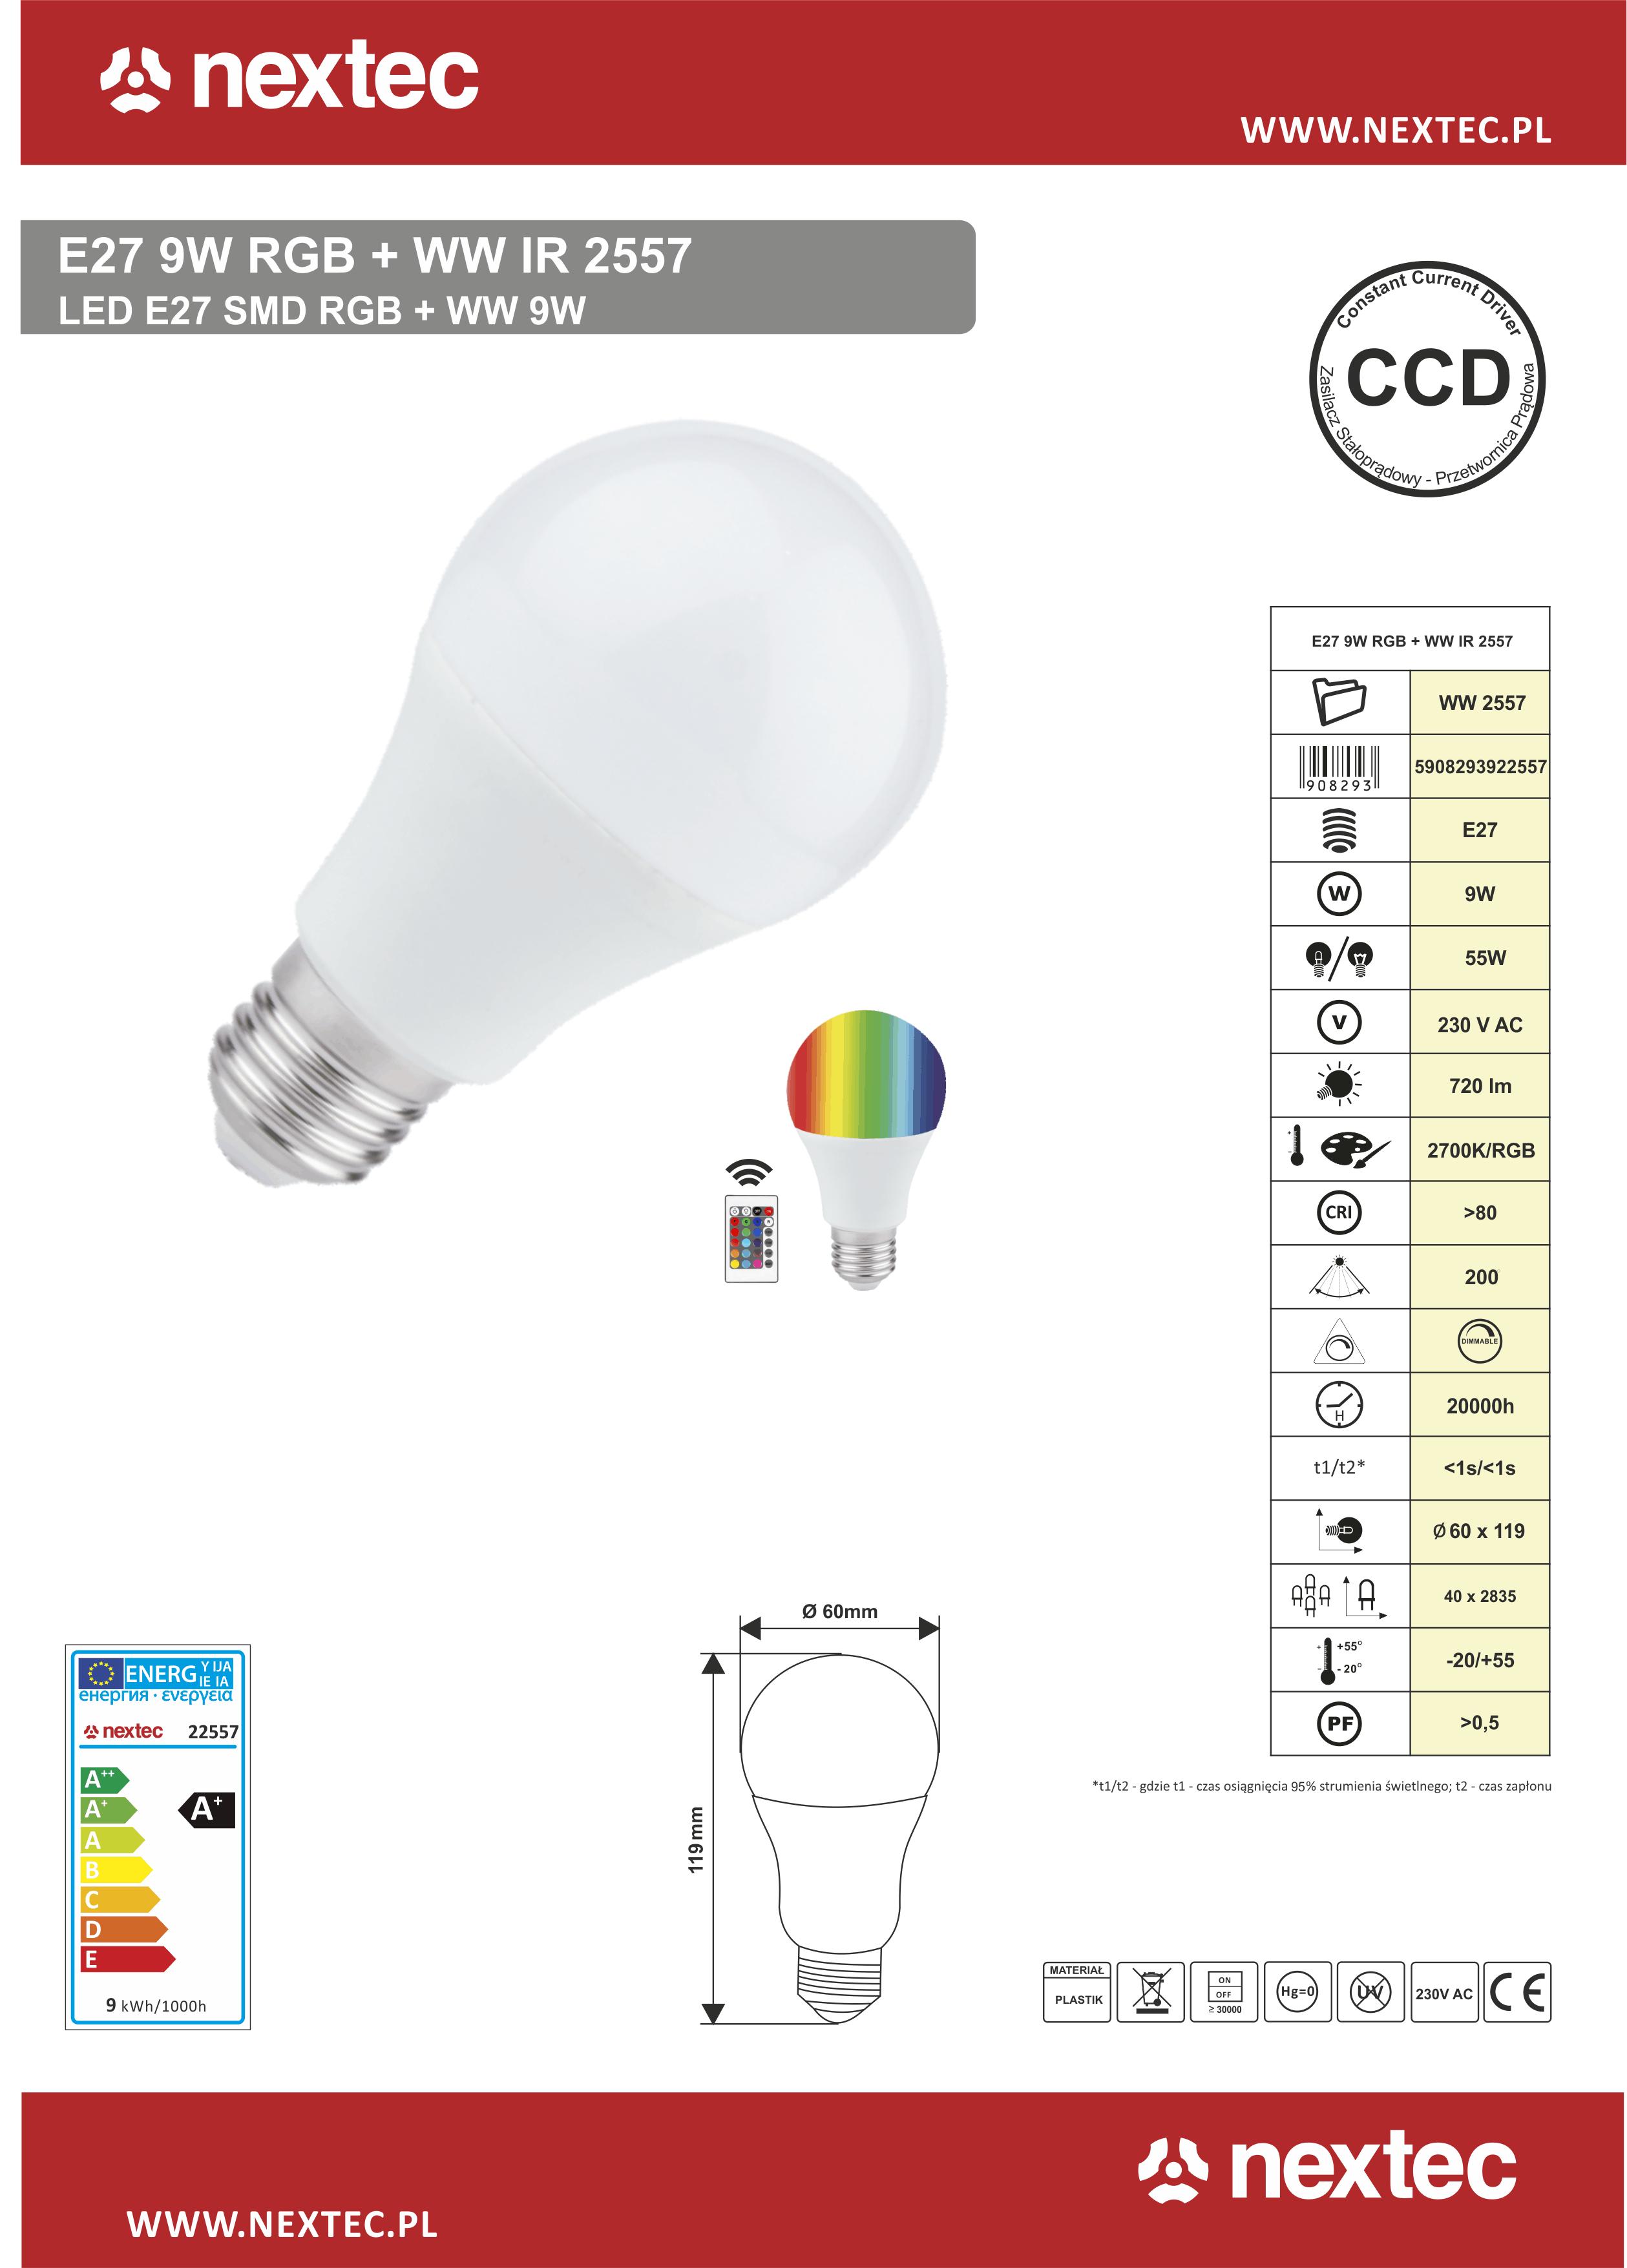 Ledlamppu E27 9W WW+RGBkauko-ohjain